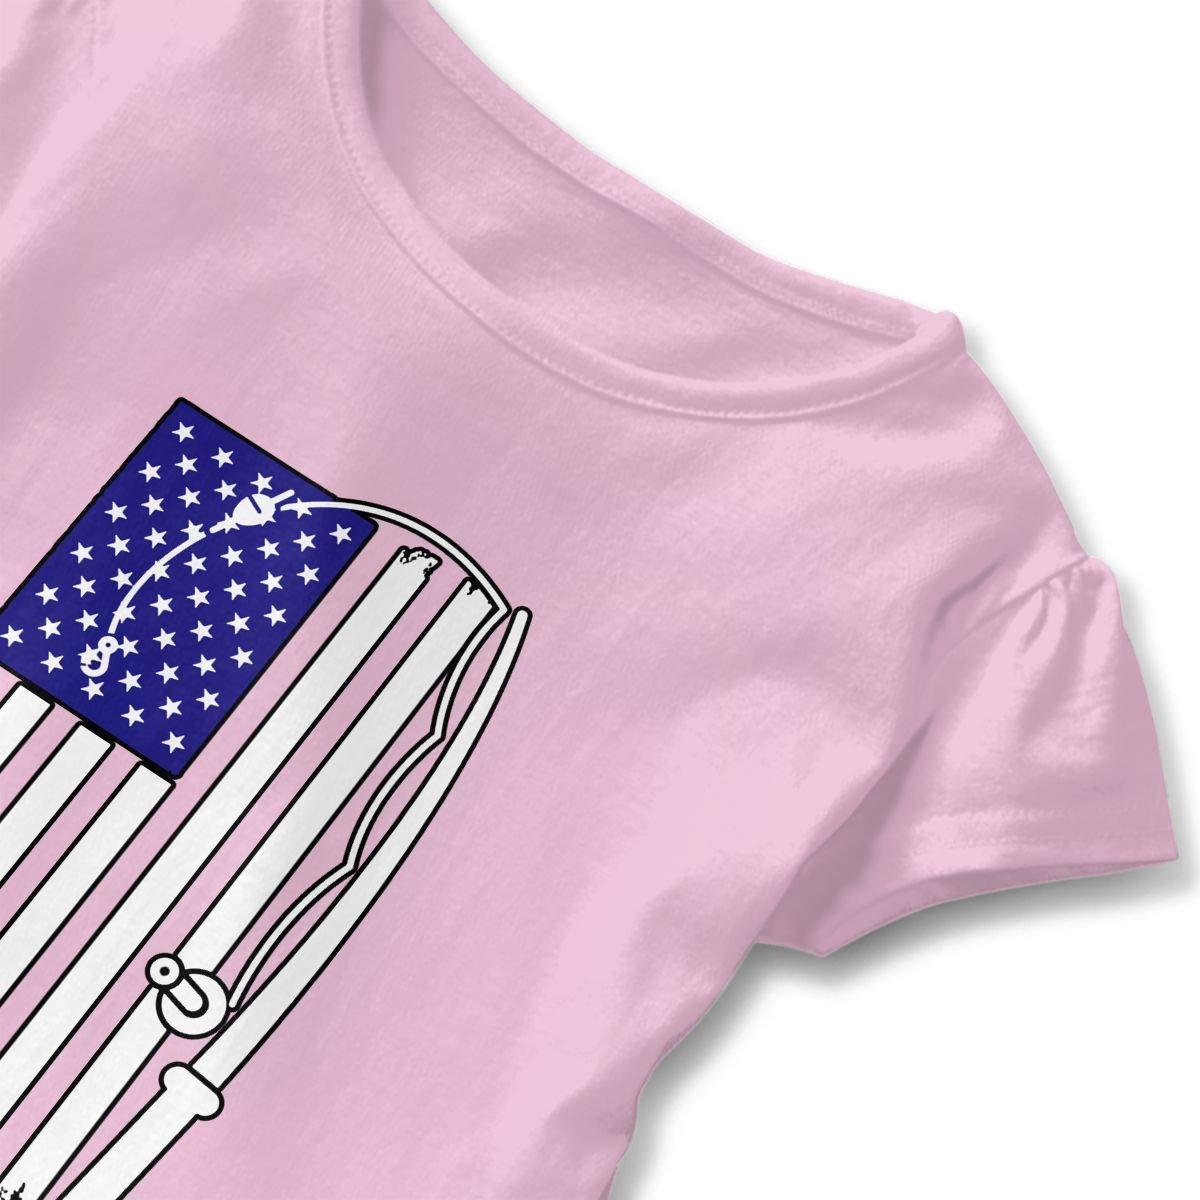 ZP-CCYF American Fishing Rod /& Hook Flag Toddler Baby Girl Ruffle Short Sleeve T-Shirt Comfortable Cotton T Shirts